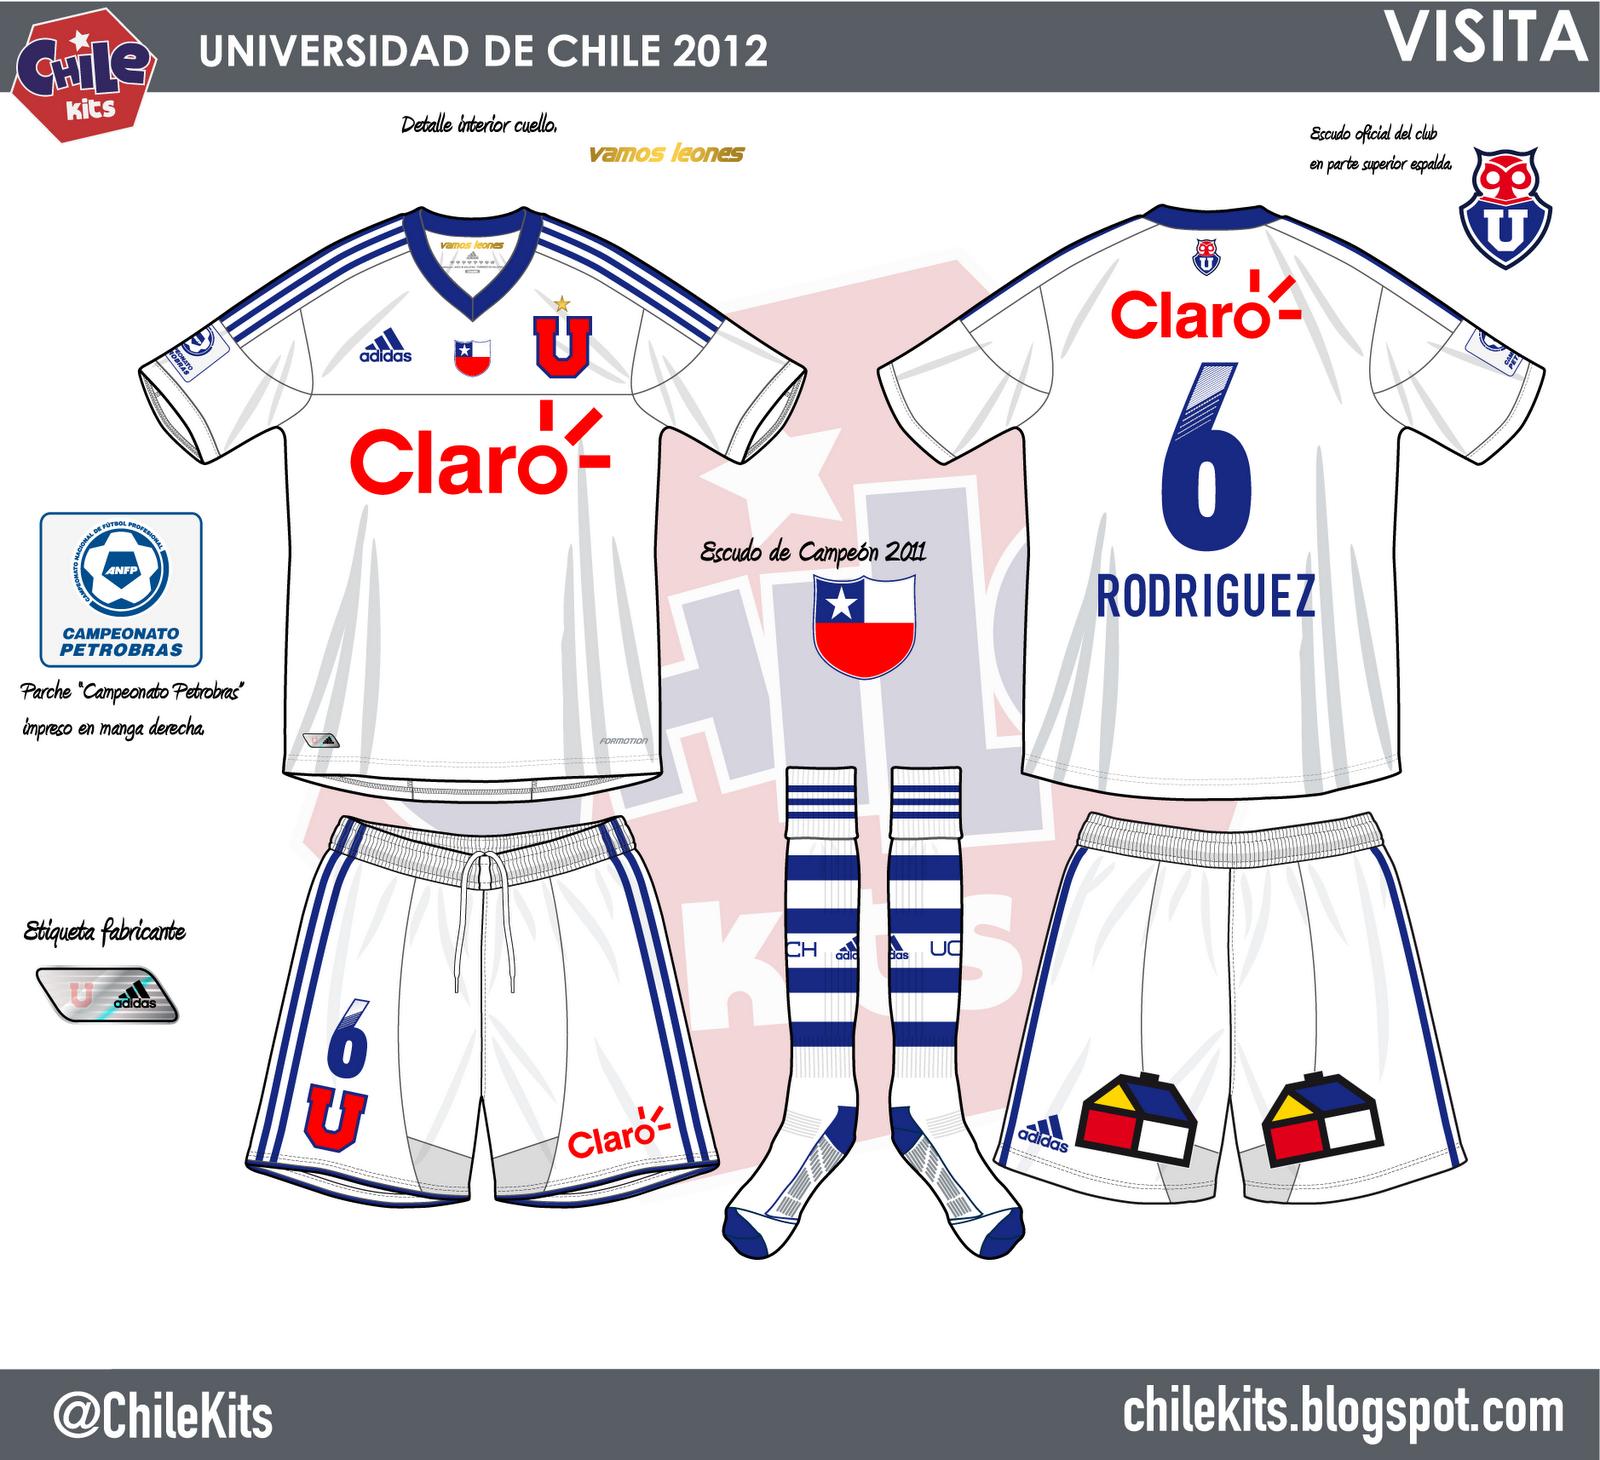 http://2.bp.blogspot.com/-pRnf89D5Gi8/T0F_FdRsN8I/AAAAAAAAB9k/VHZJAaV1ih0/s1600/U+DE+CHILE+2012_visita.png